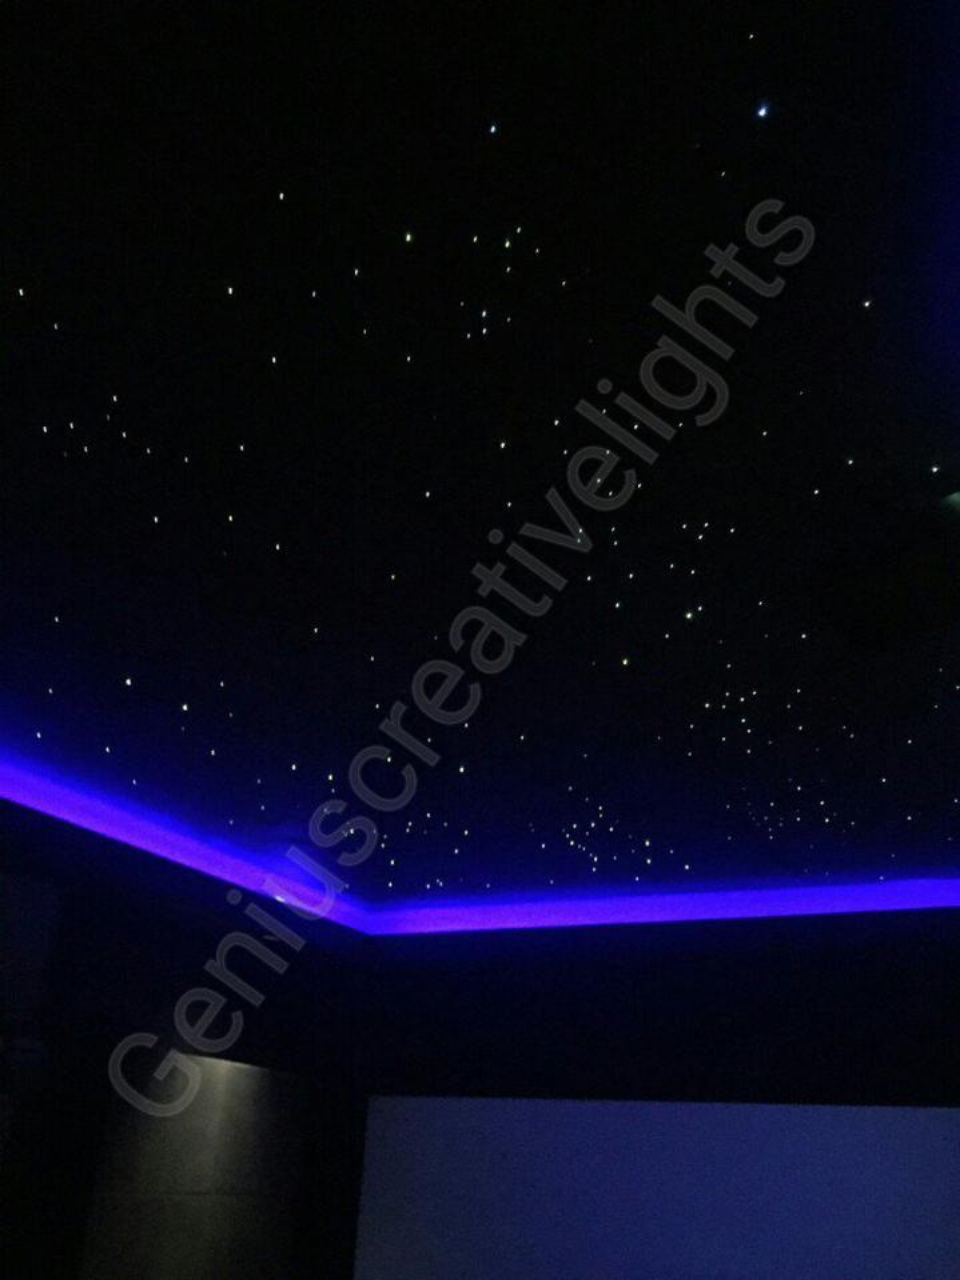 Fiber optic stars ceiling(ดาวบนฝ้าเพดาน) รูปที่ 1